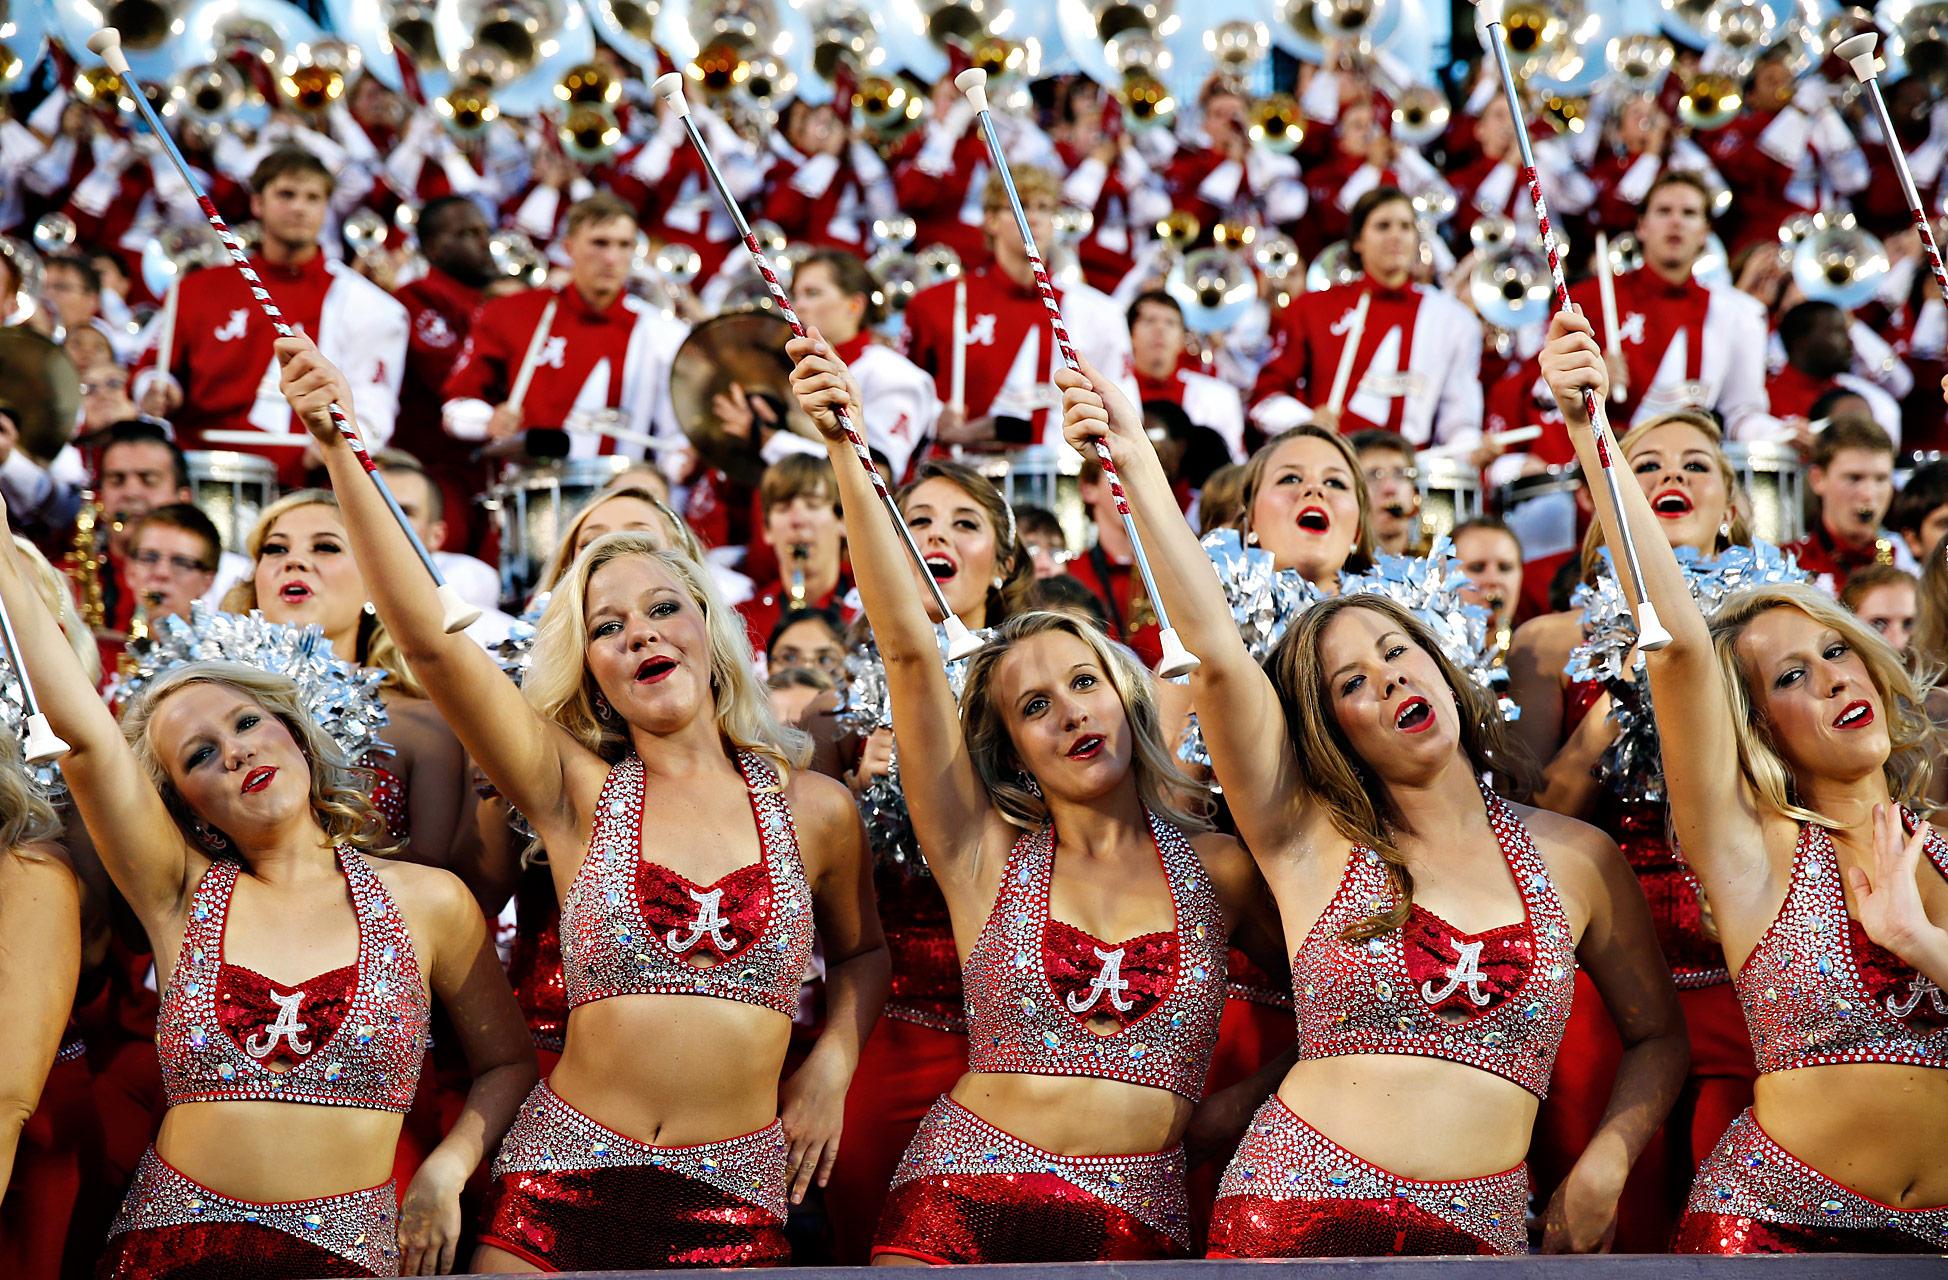 Alabama Crimsonettes